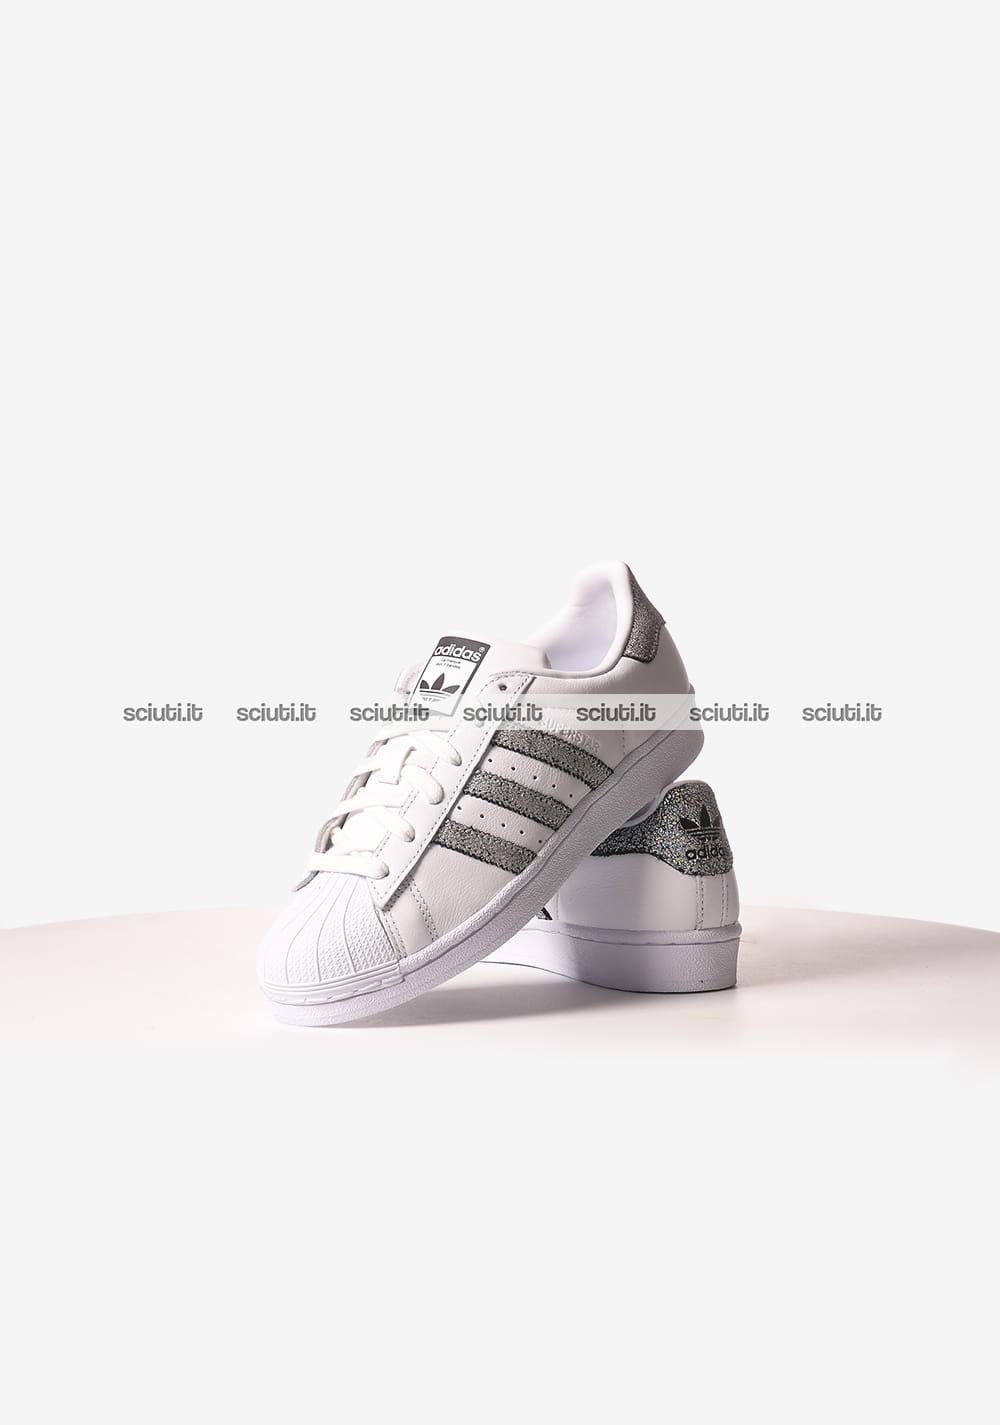 on sale 2a09a 3e67e Scarpe Adidas donna Superstar